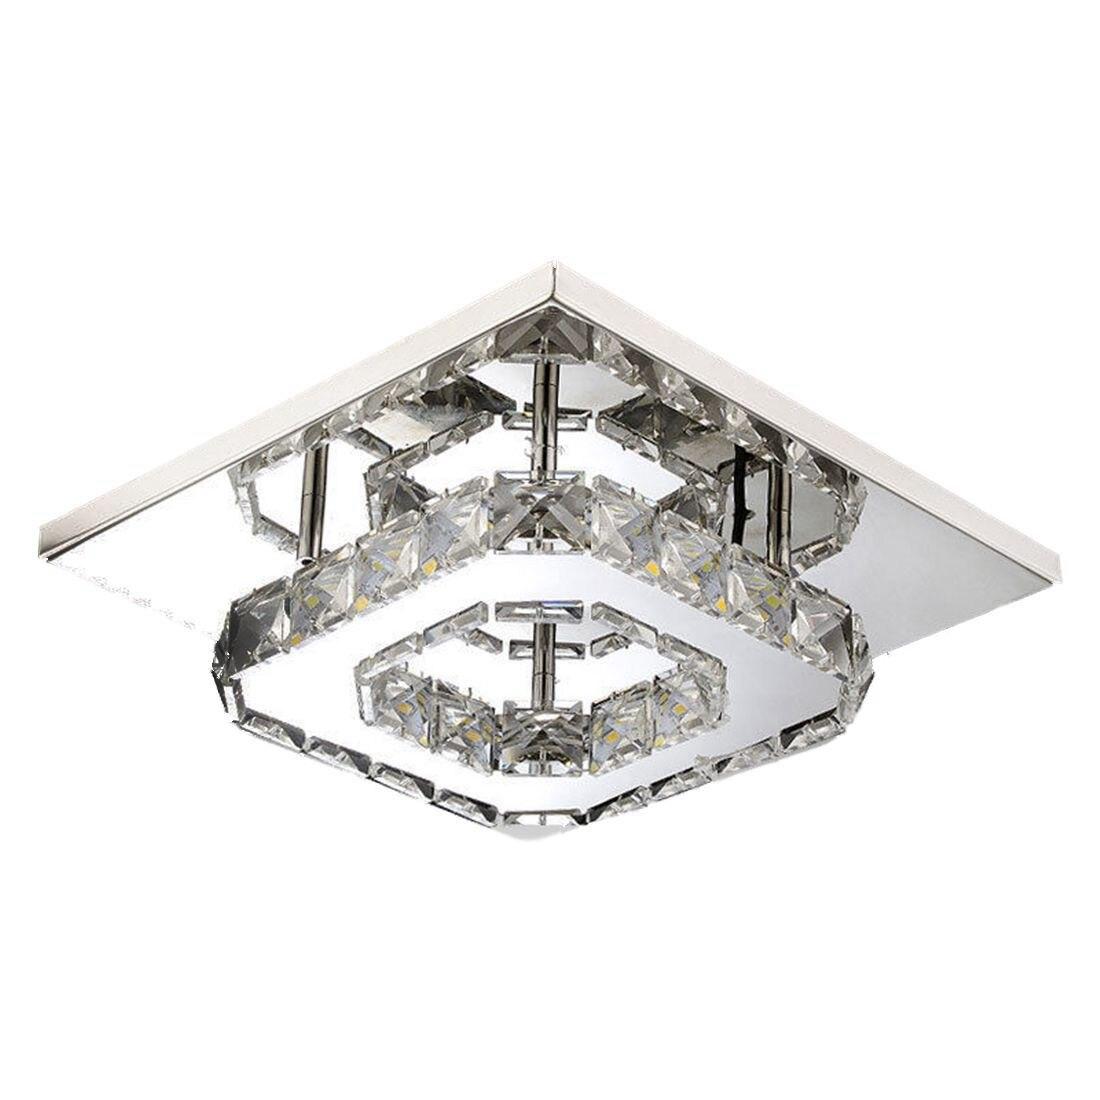 Lámpara de techo de cristal de acero inoxidable de BIFI-20 CM lámpara de araña de cristal claro para pasillo lámpara de techo